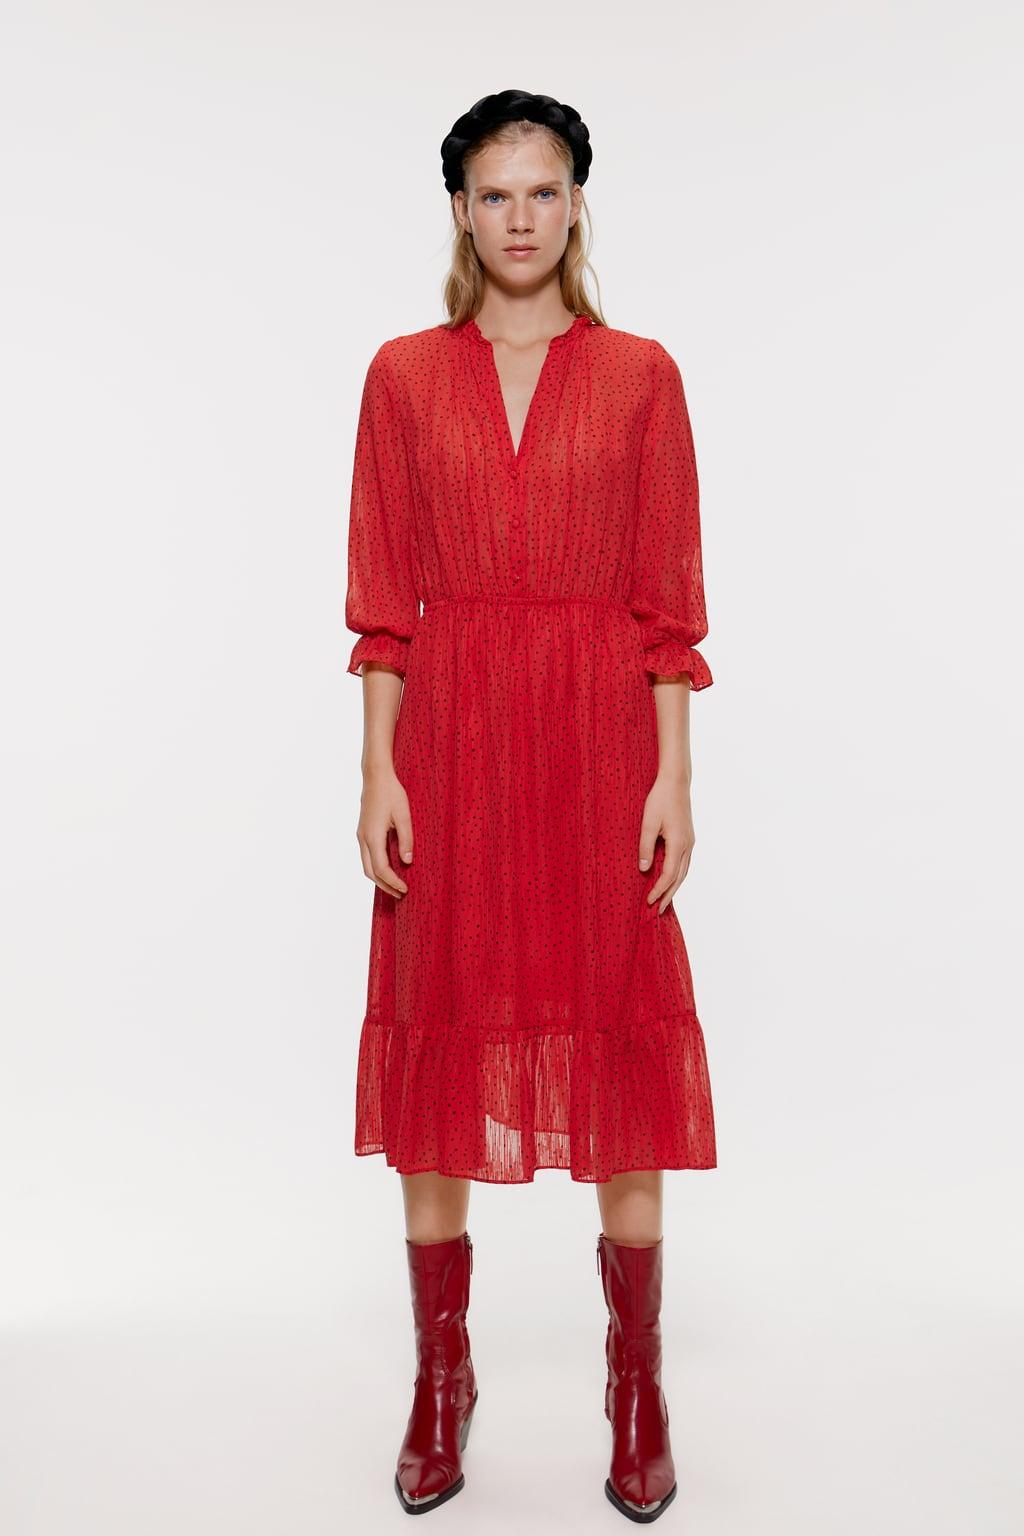 Zara, 599 грн